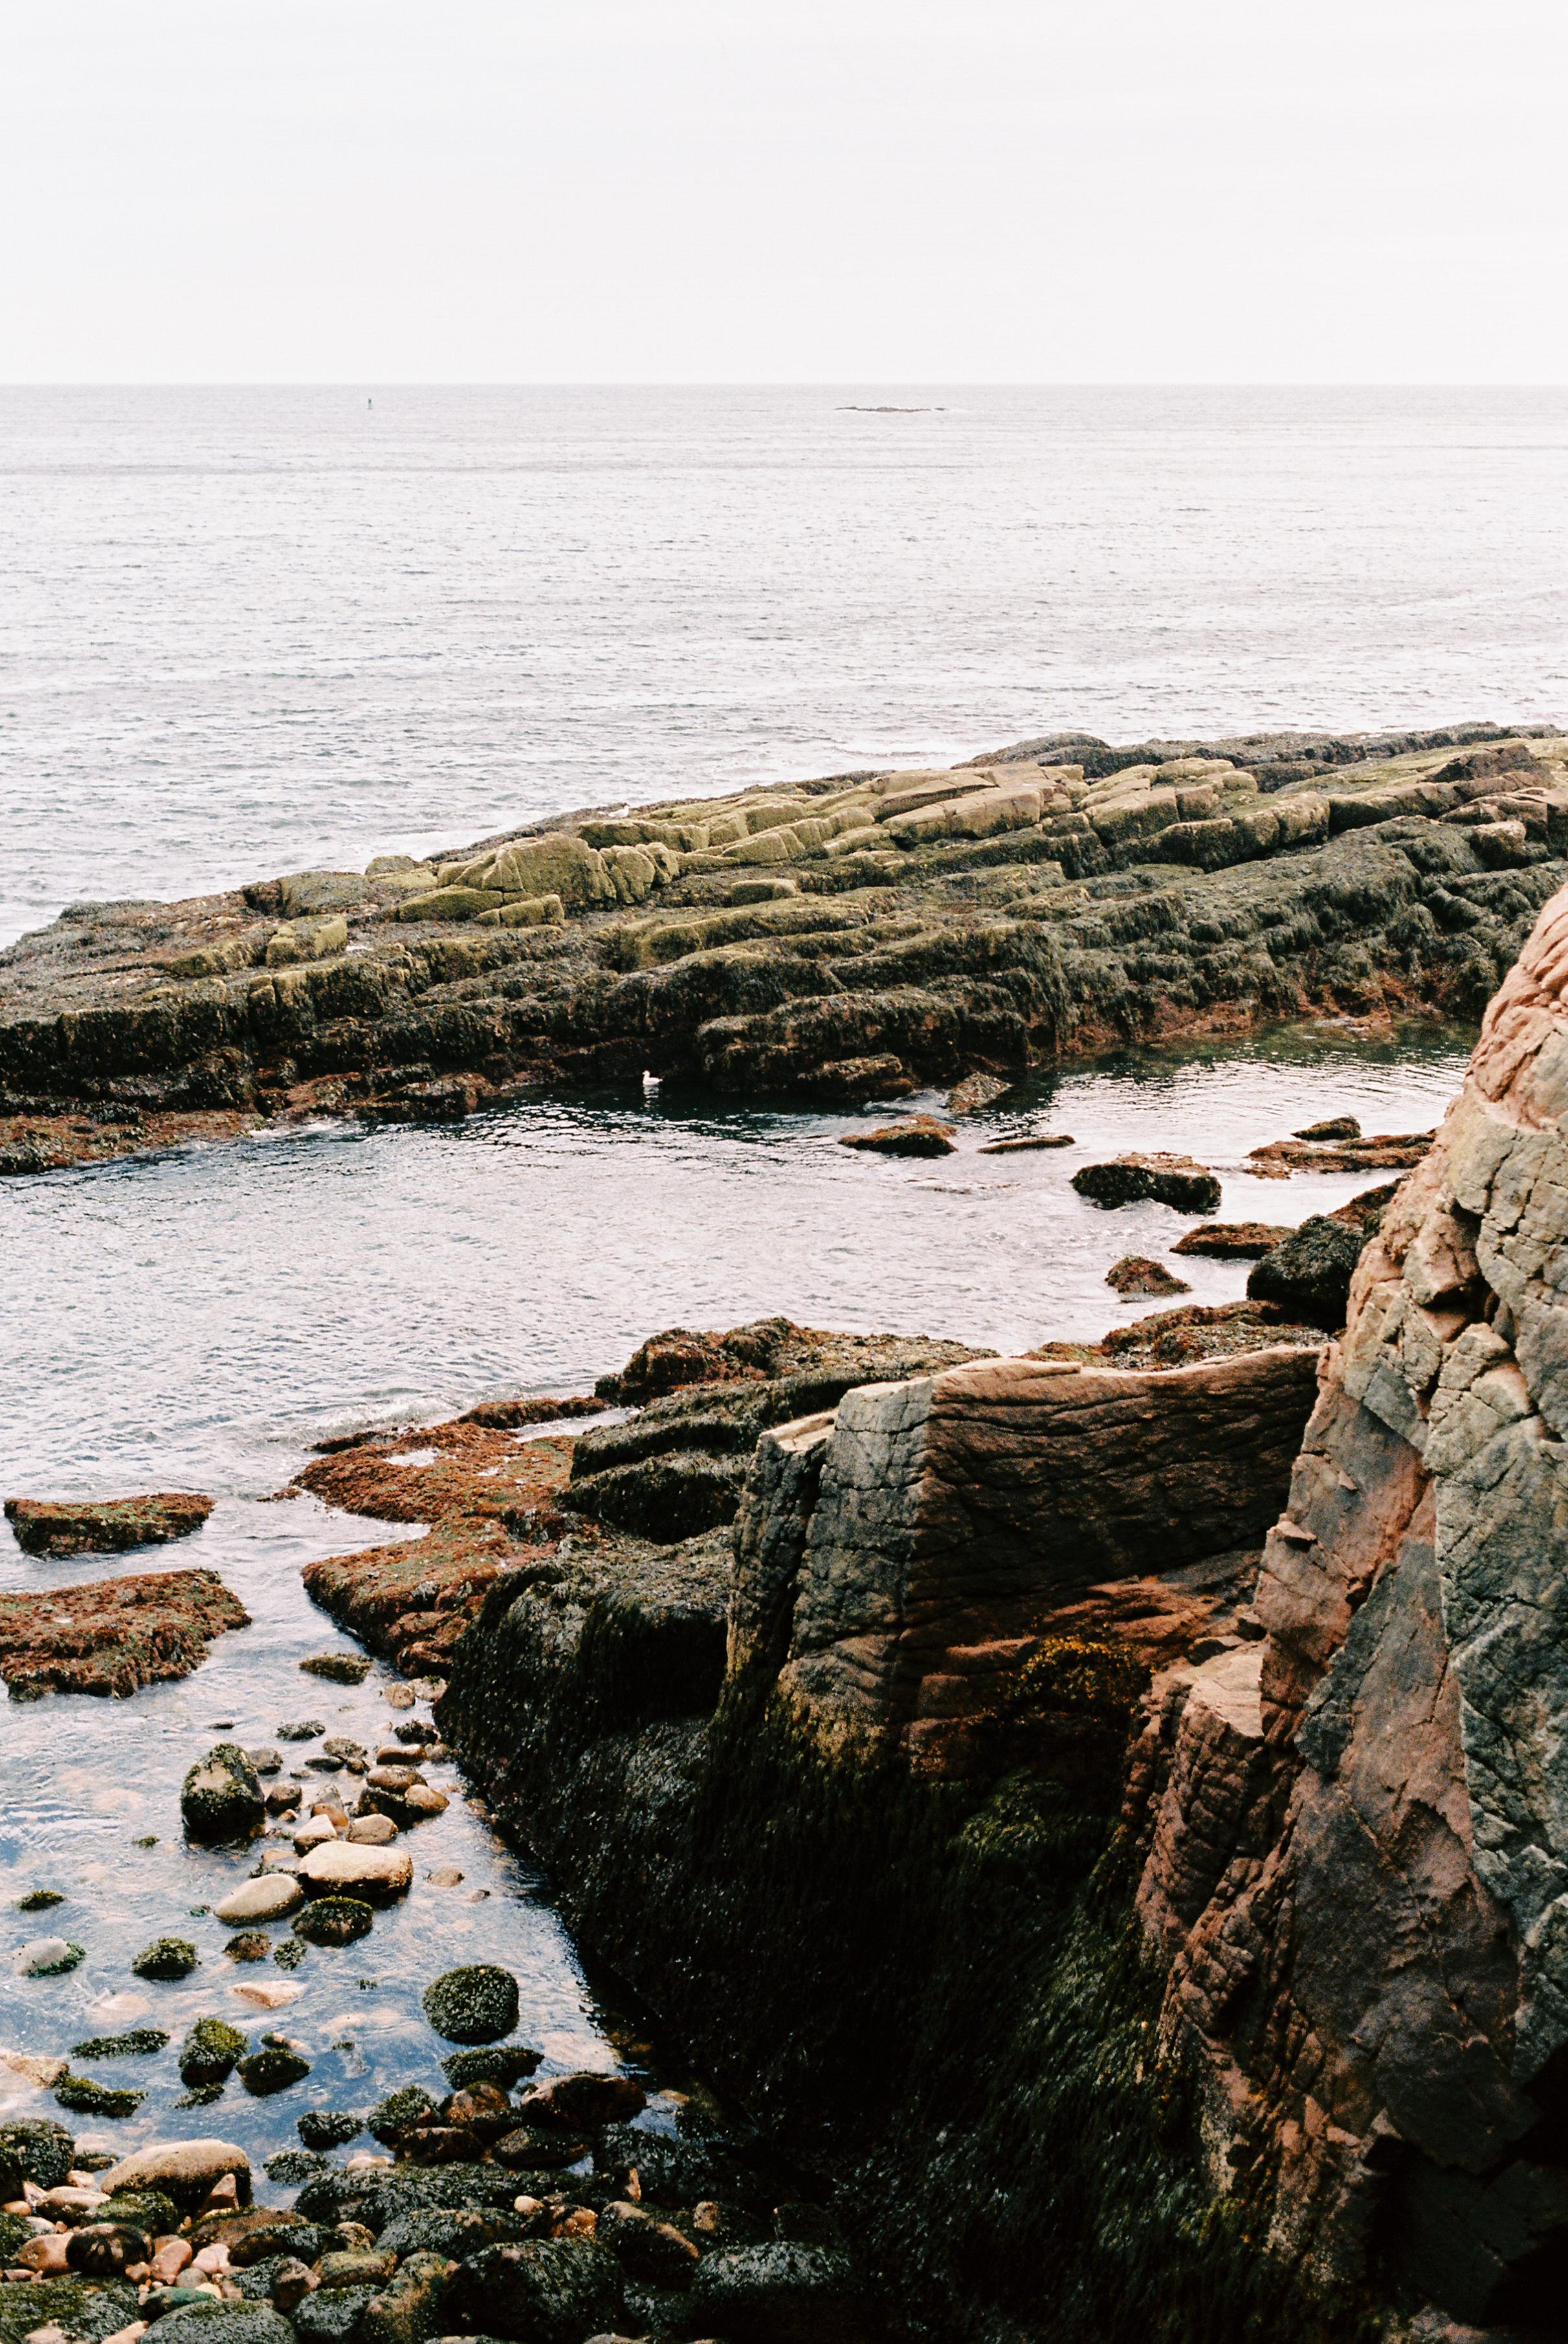 The Coast. [Nikon F3 / 50 / Kodak Ektar]